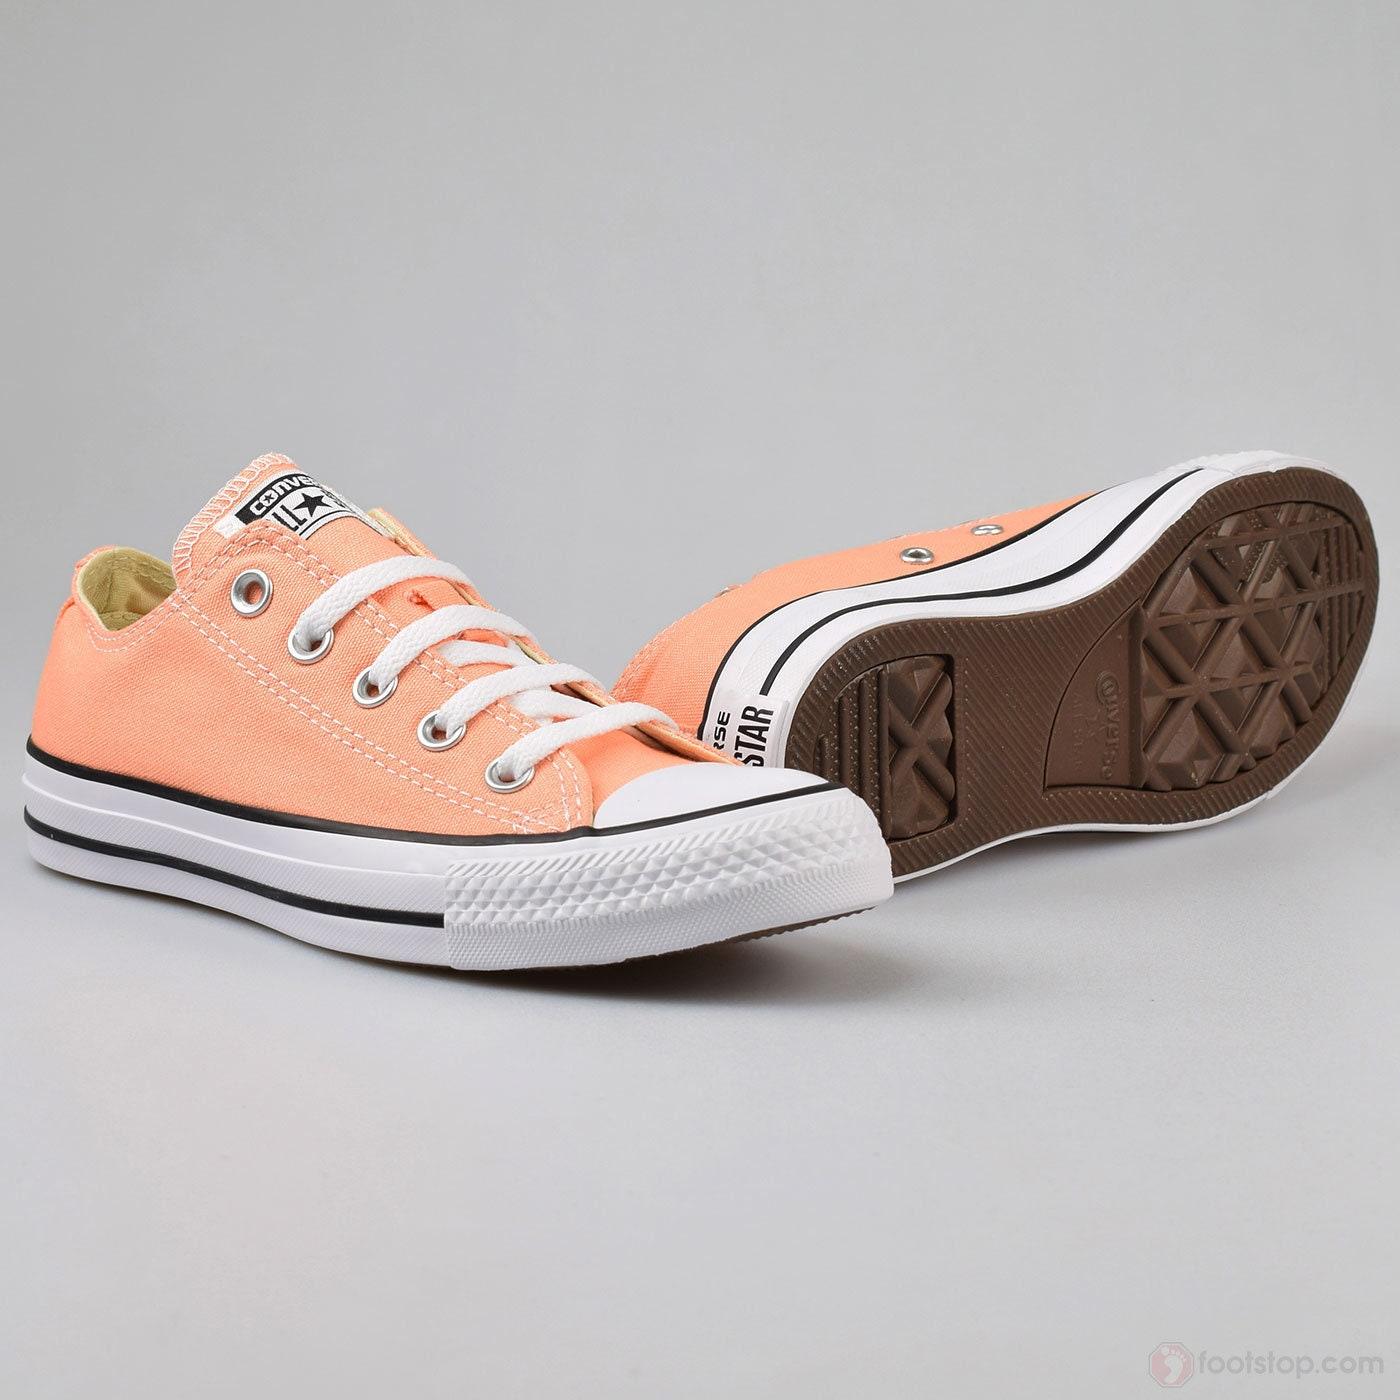 Peach Converse Low Top Kicks Custom Rose Gold Sunset Apricot Swarovski  Bling Crystal Rhinestone Chuck Taylor All Star Wedding Sneakers Shoes 9e750a640